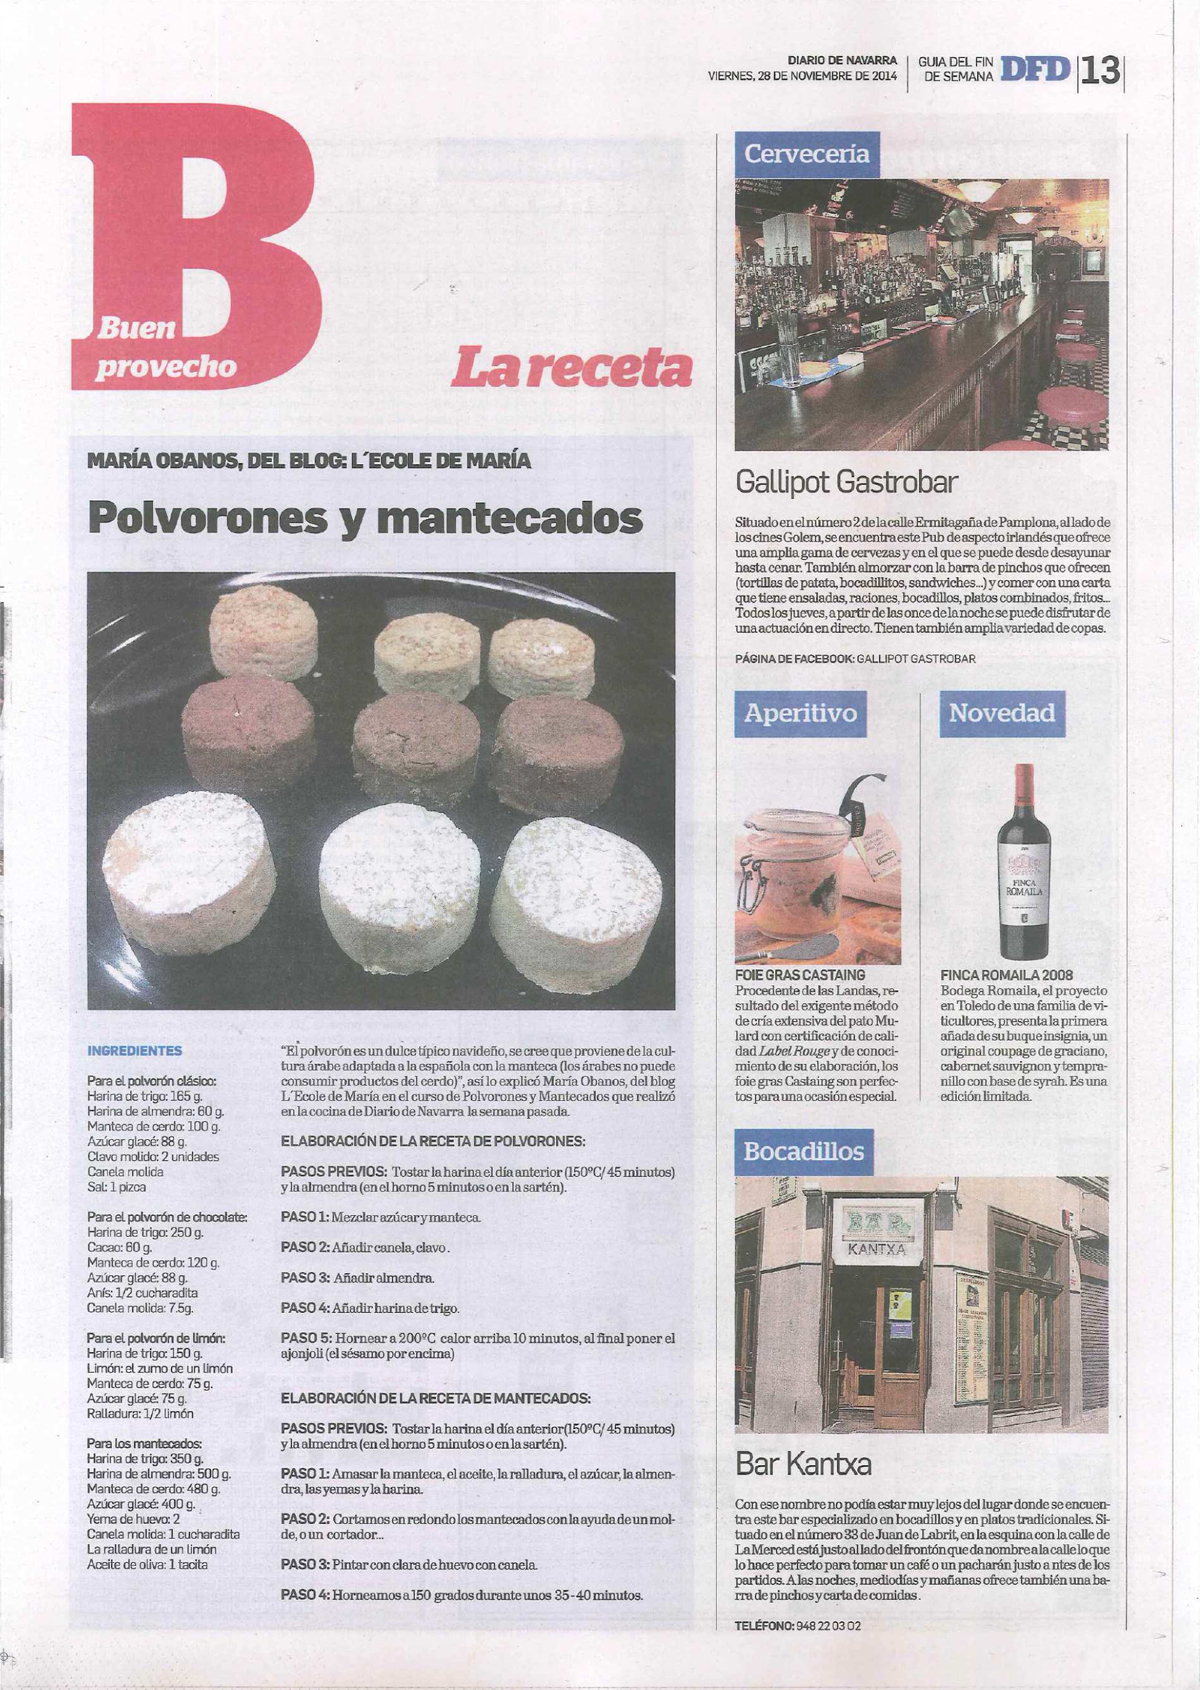 Diario de Navarra_28 noviembre 2014